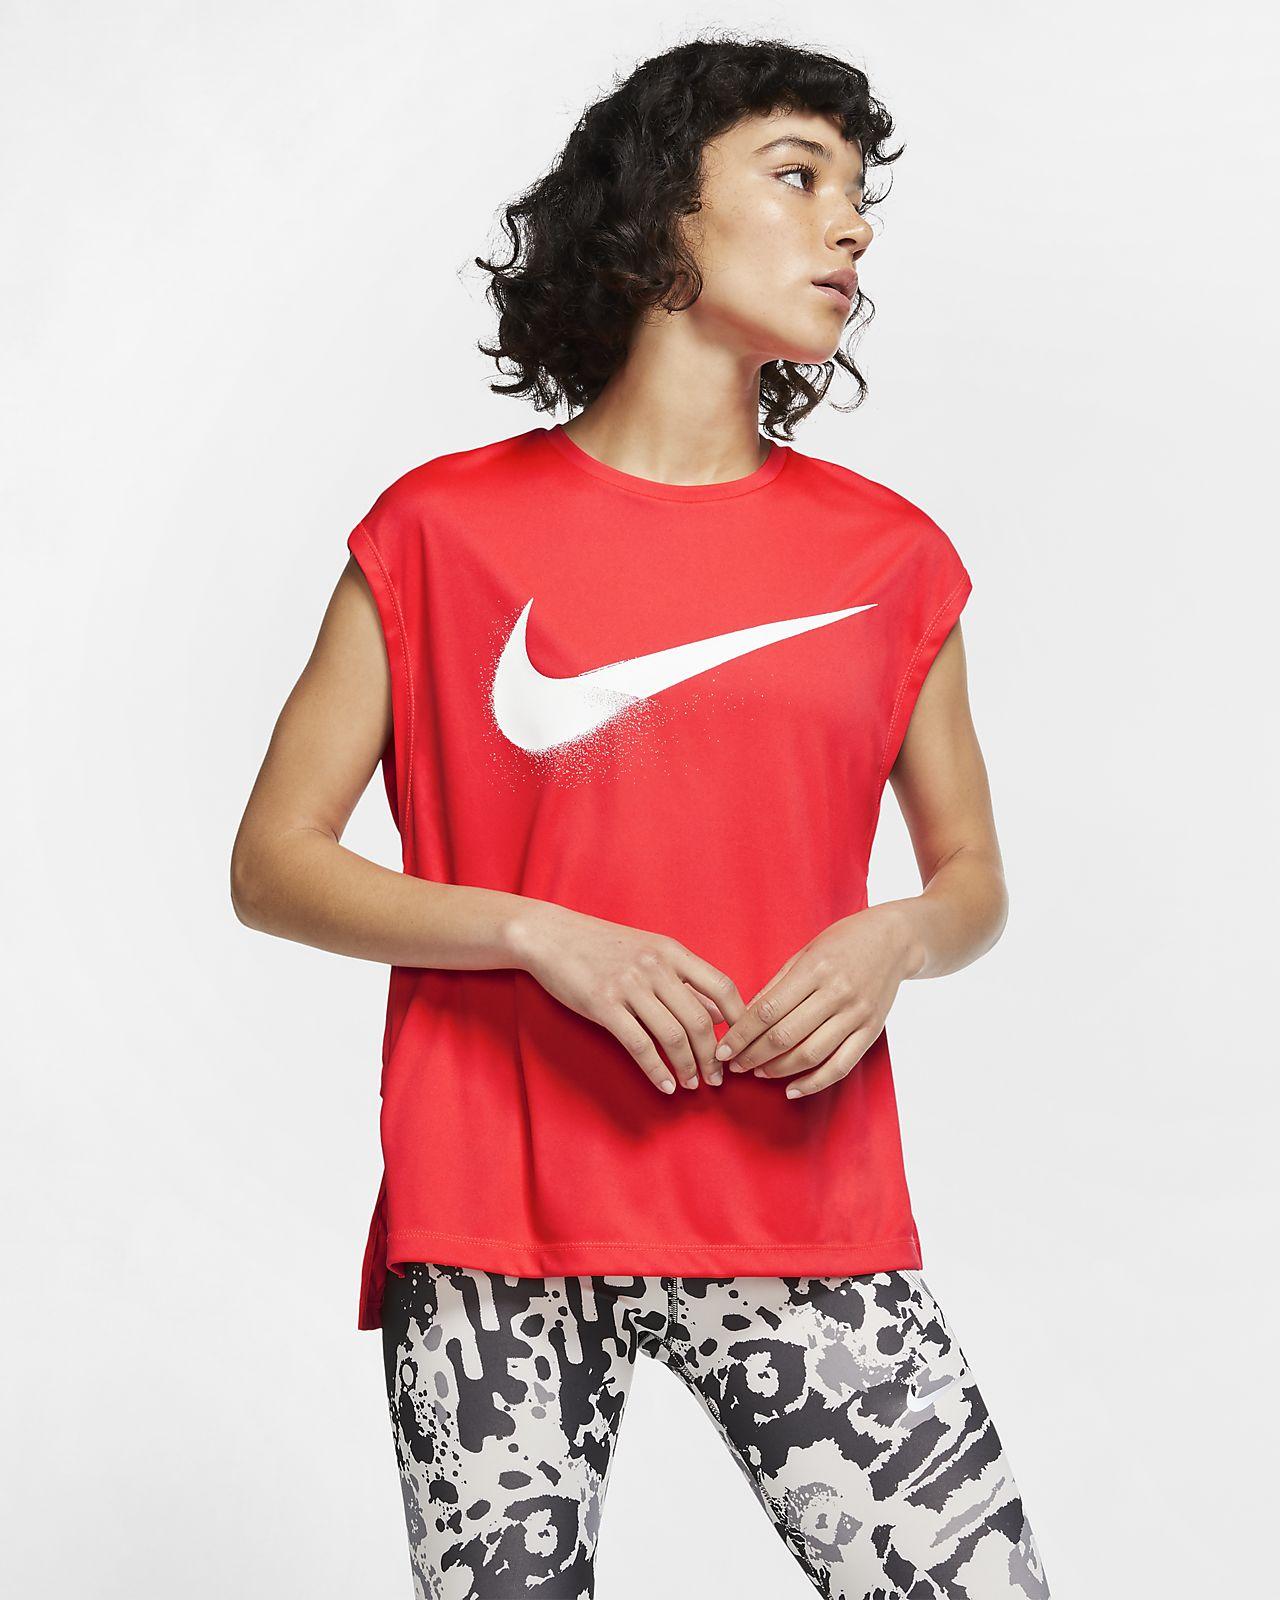 Damska koszulka do biegania z nadrukiem Nike Dri-FIT